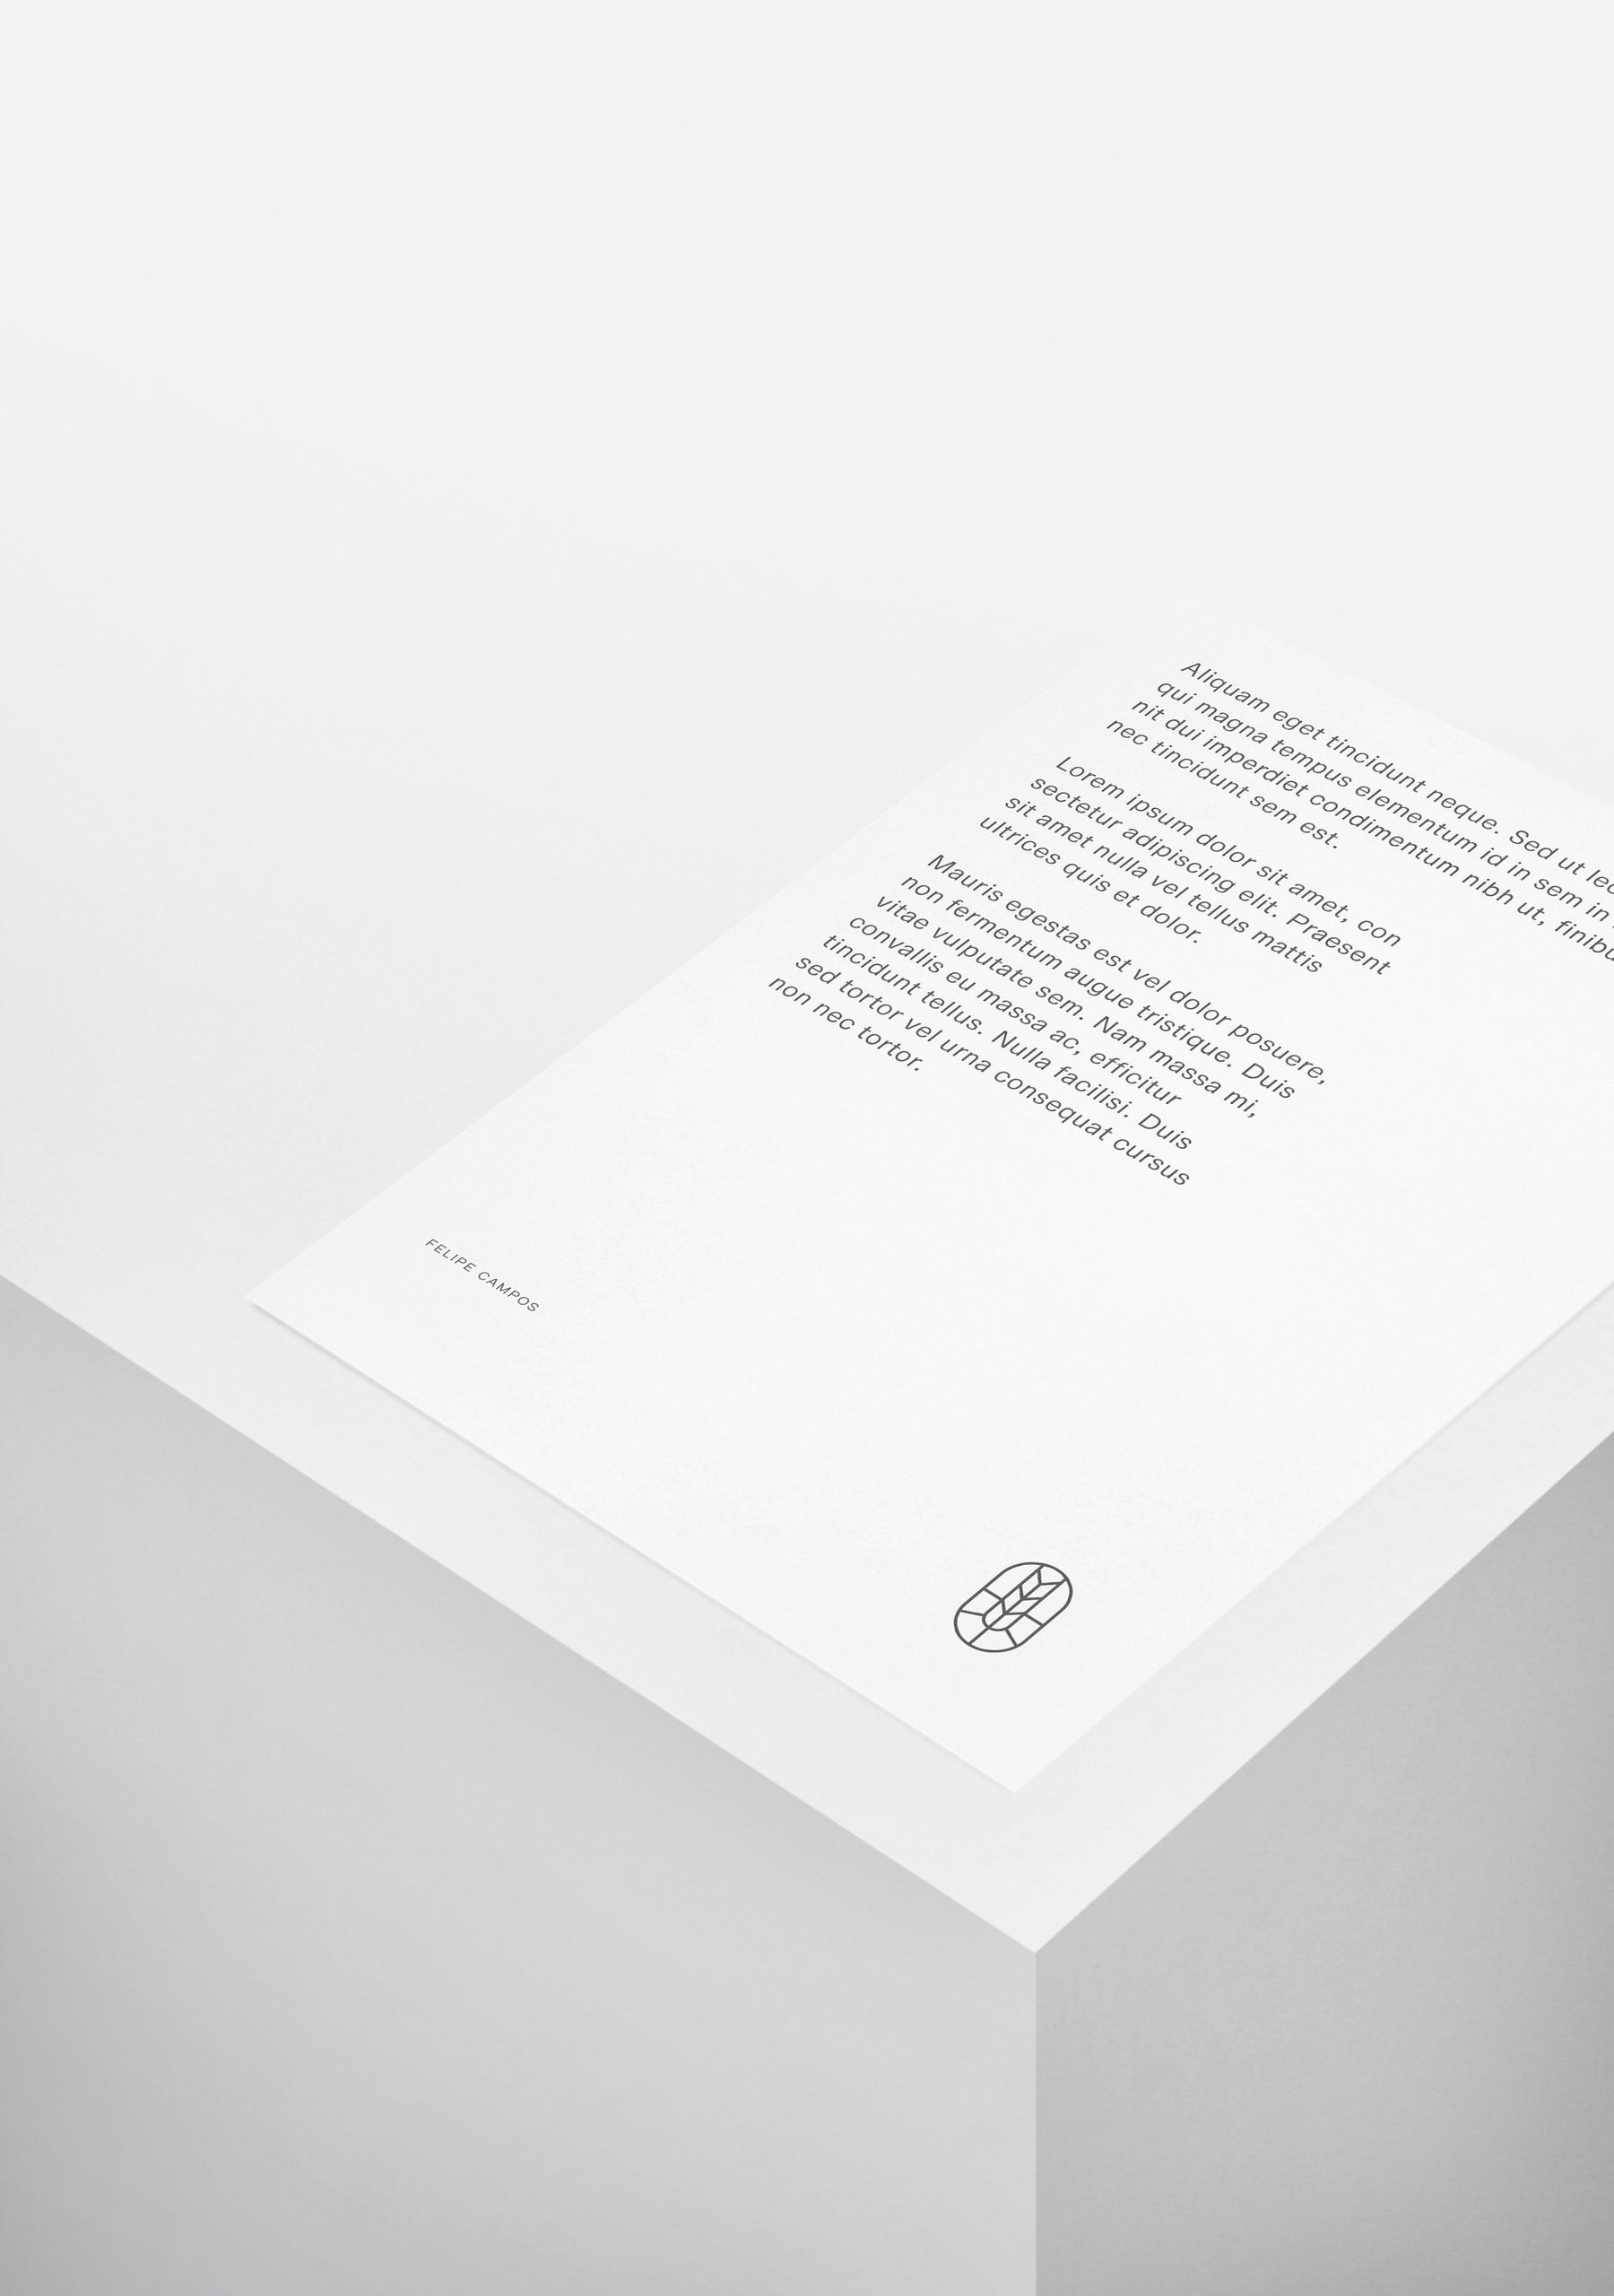 Proposal layout Felipe Campos.  - cesarebrand | ello